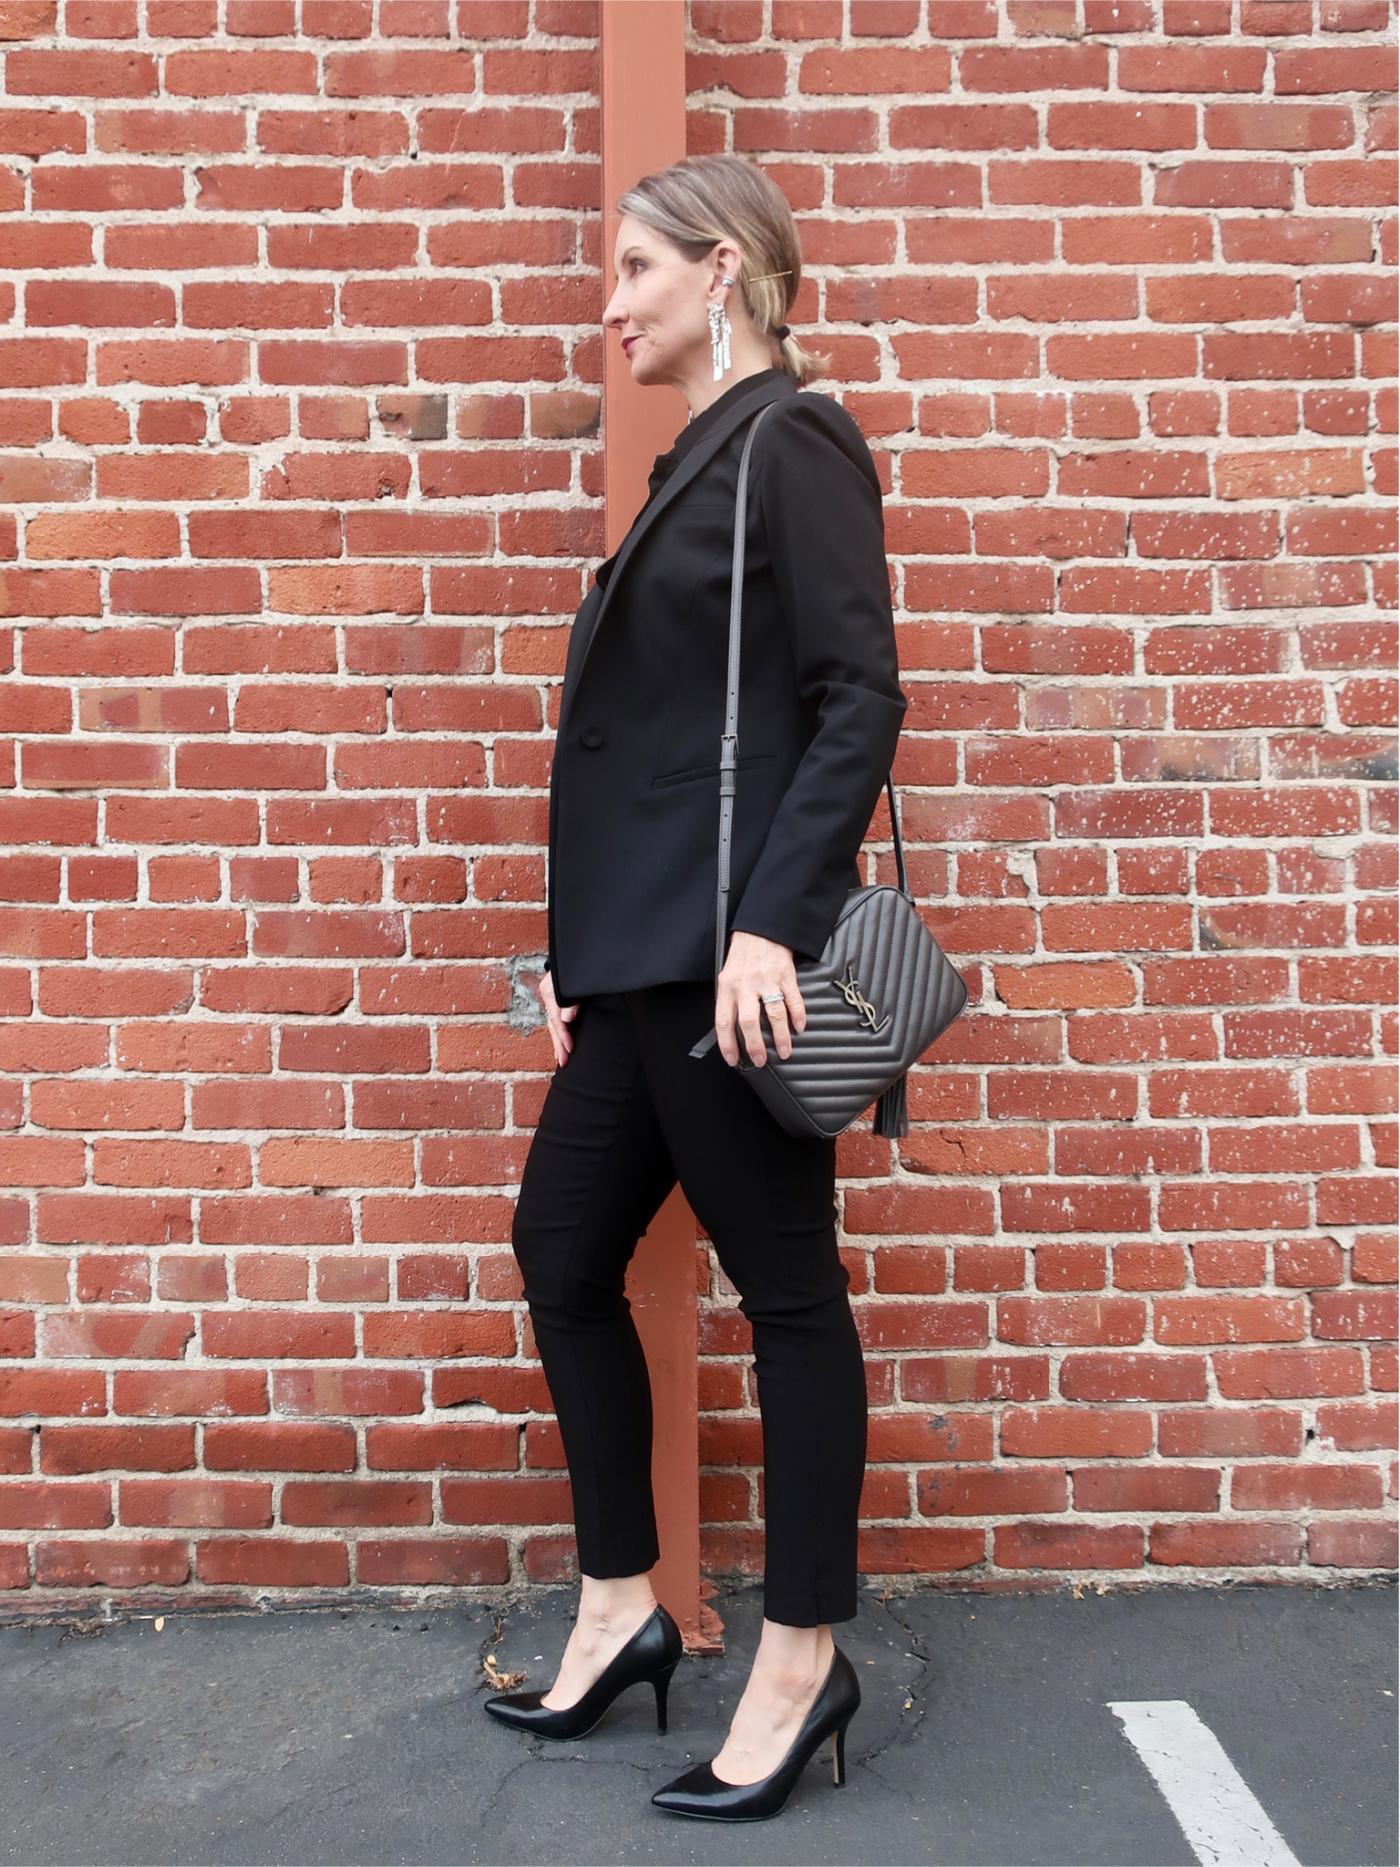 All black, statement earrings, YSL bag